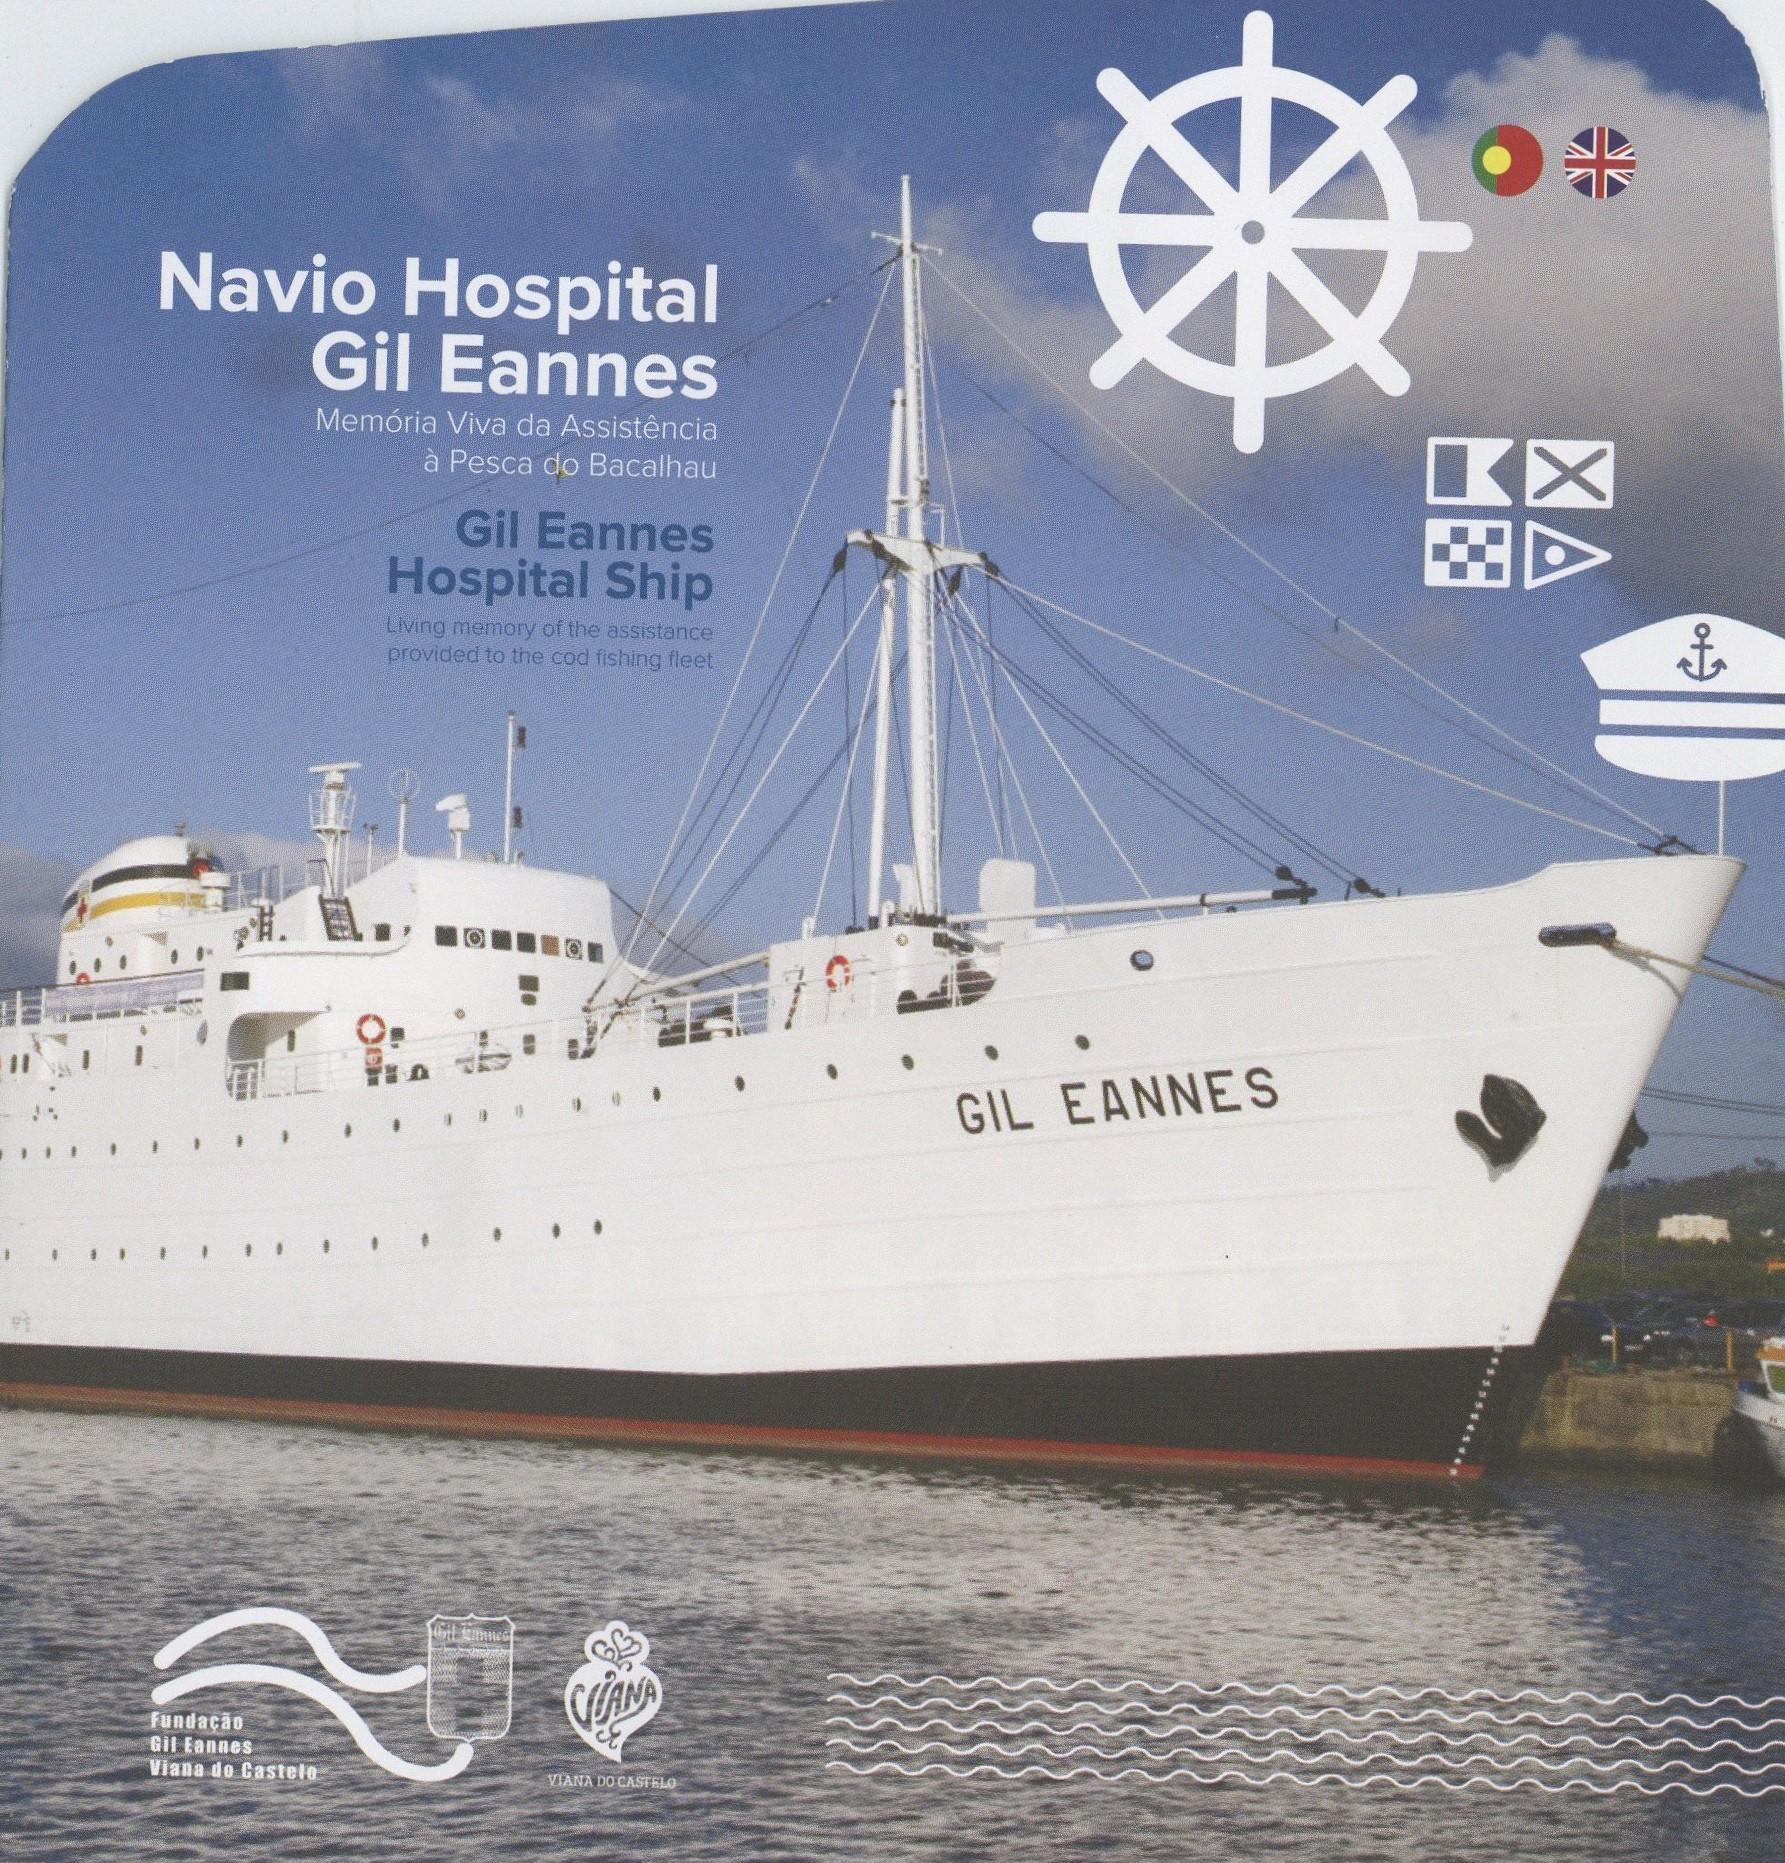 Navio Hospital Gil Eannes – memória viva da assistência à pesca do bacalhau / Gil Eannes Hospital Ship – Living memory of the assistance provided to the cod fishing fleet